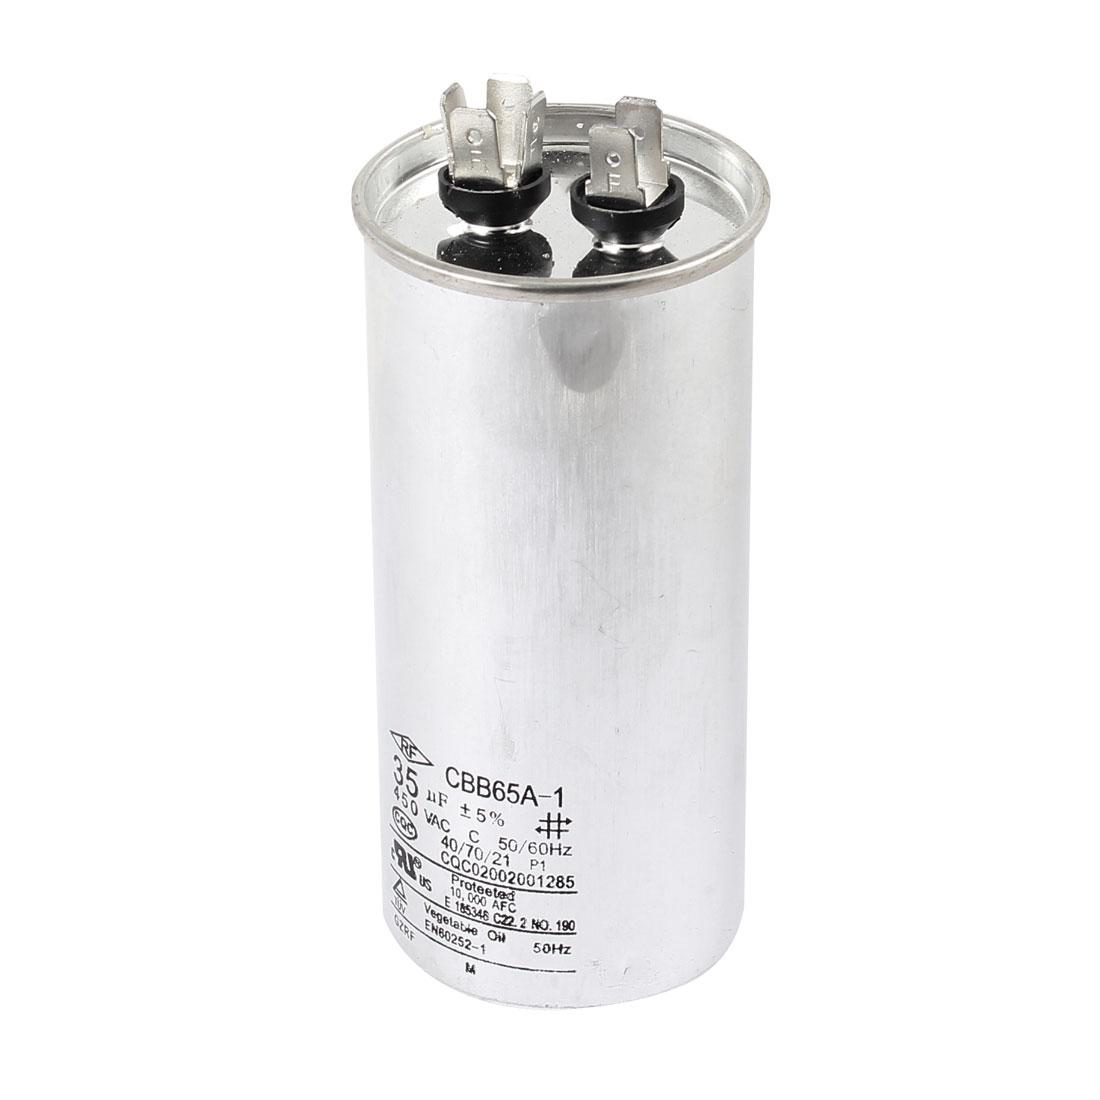 Cylinder Polypropylene Film Running Motor Capacitor CBB65A-1 AC450V 35uF 50/60Hz